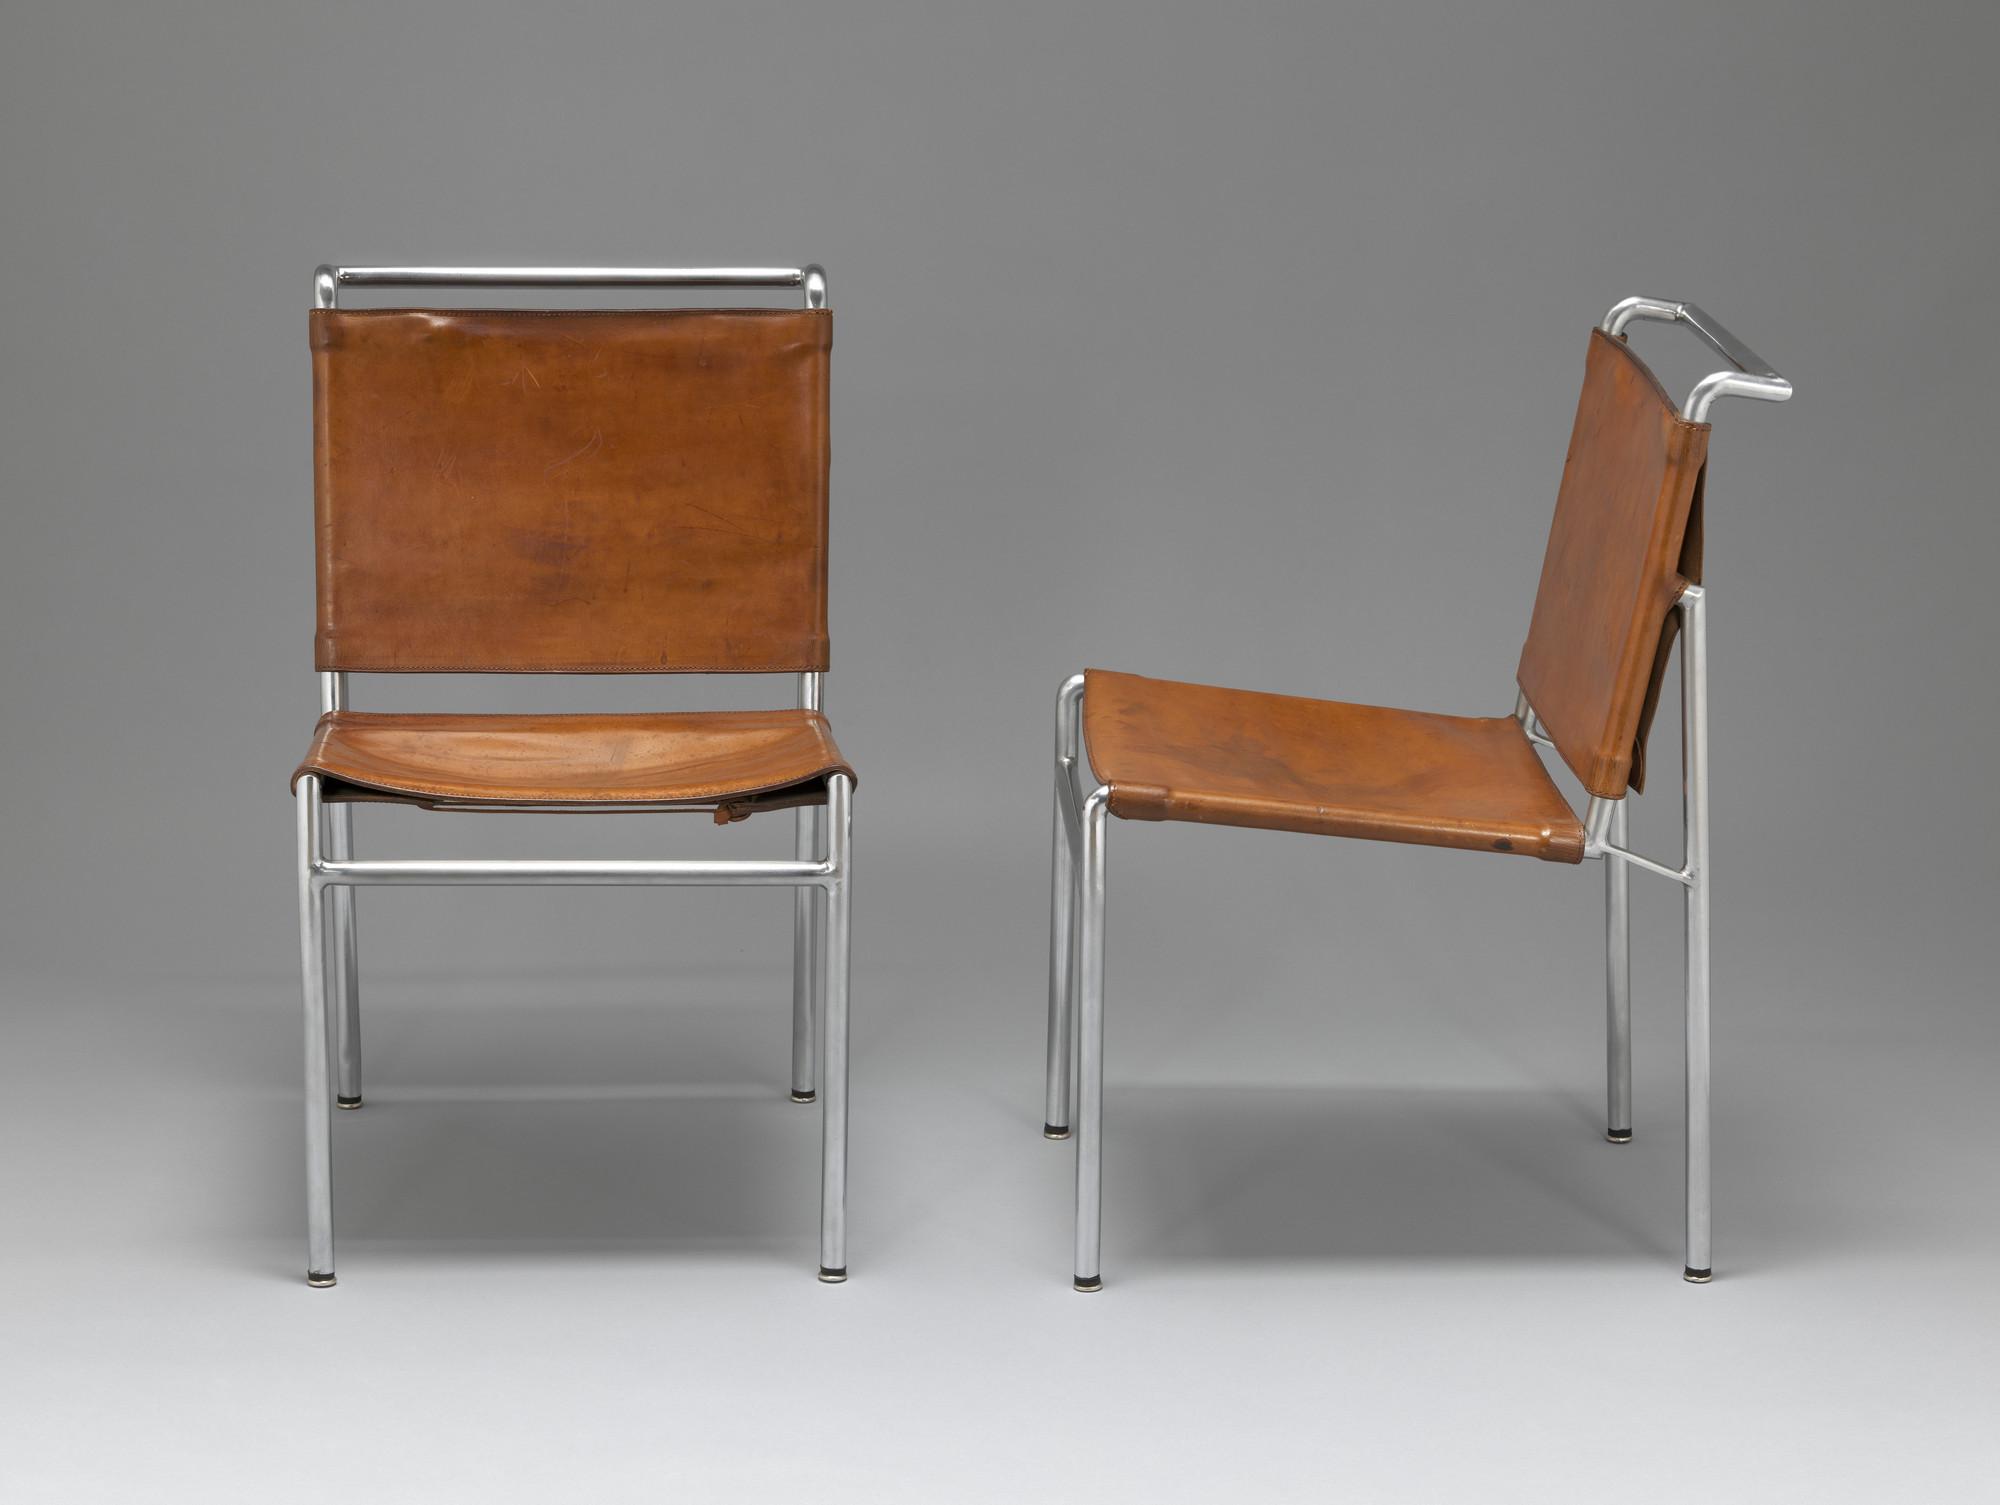 eileen gray chair for the villa tempe a pailla c1935 - Eileen Grey Tisch